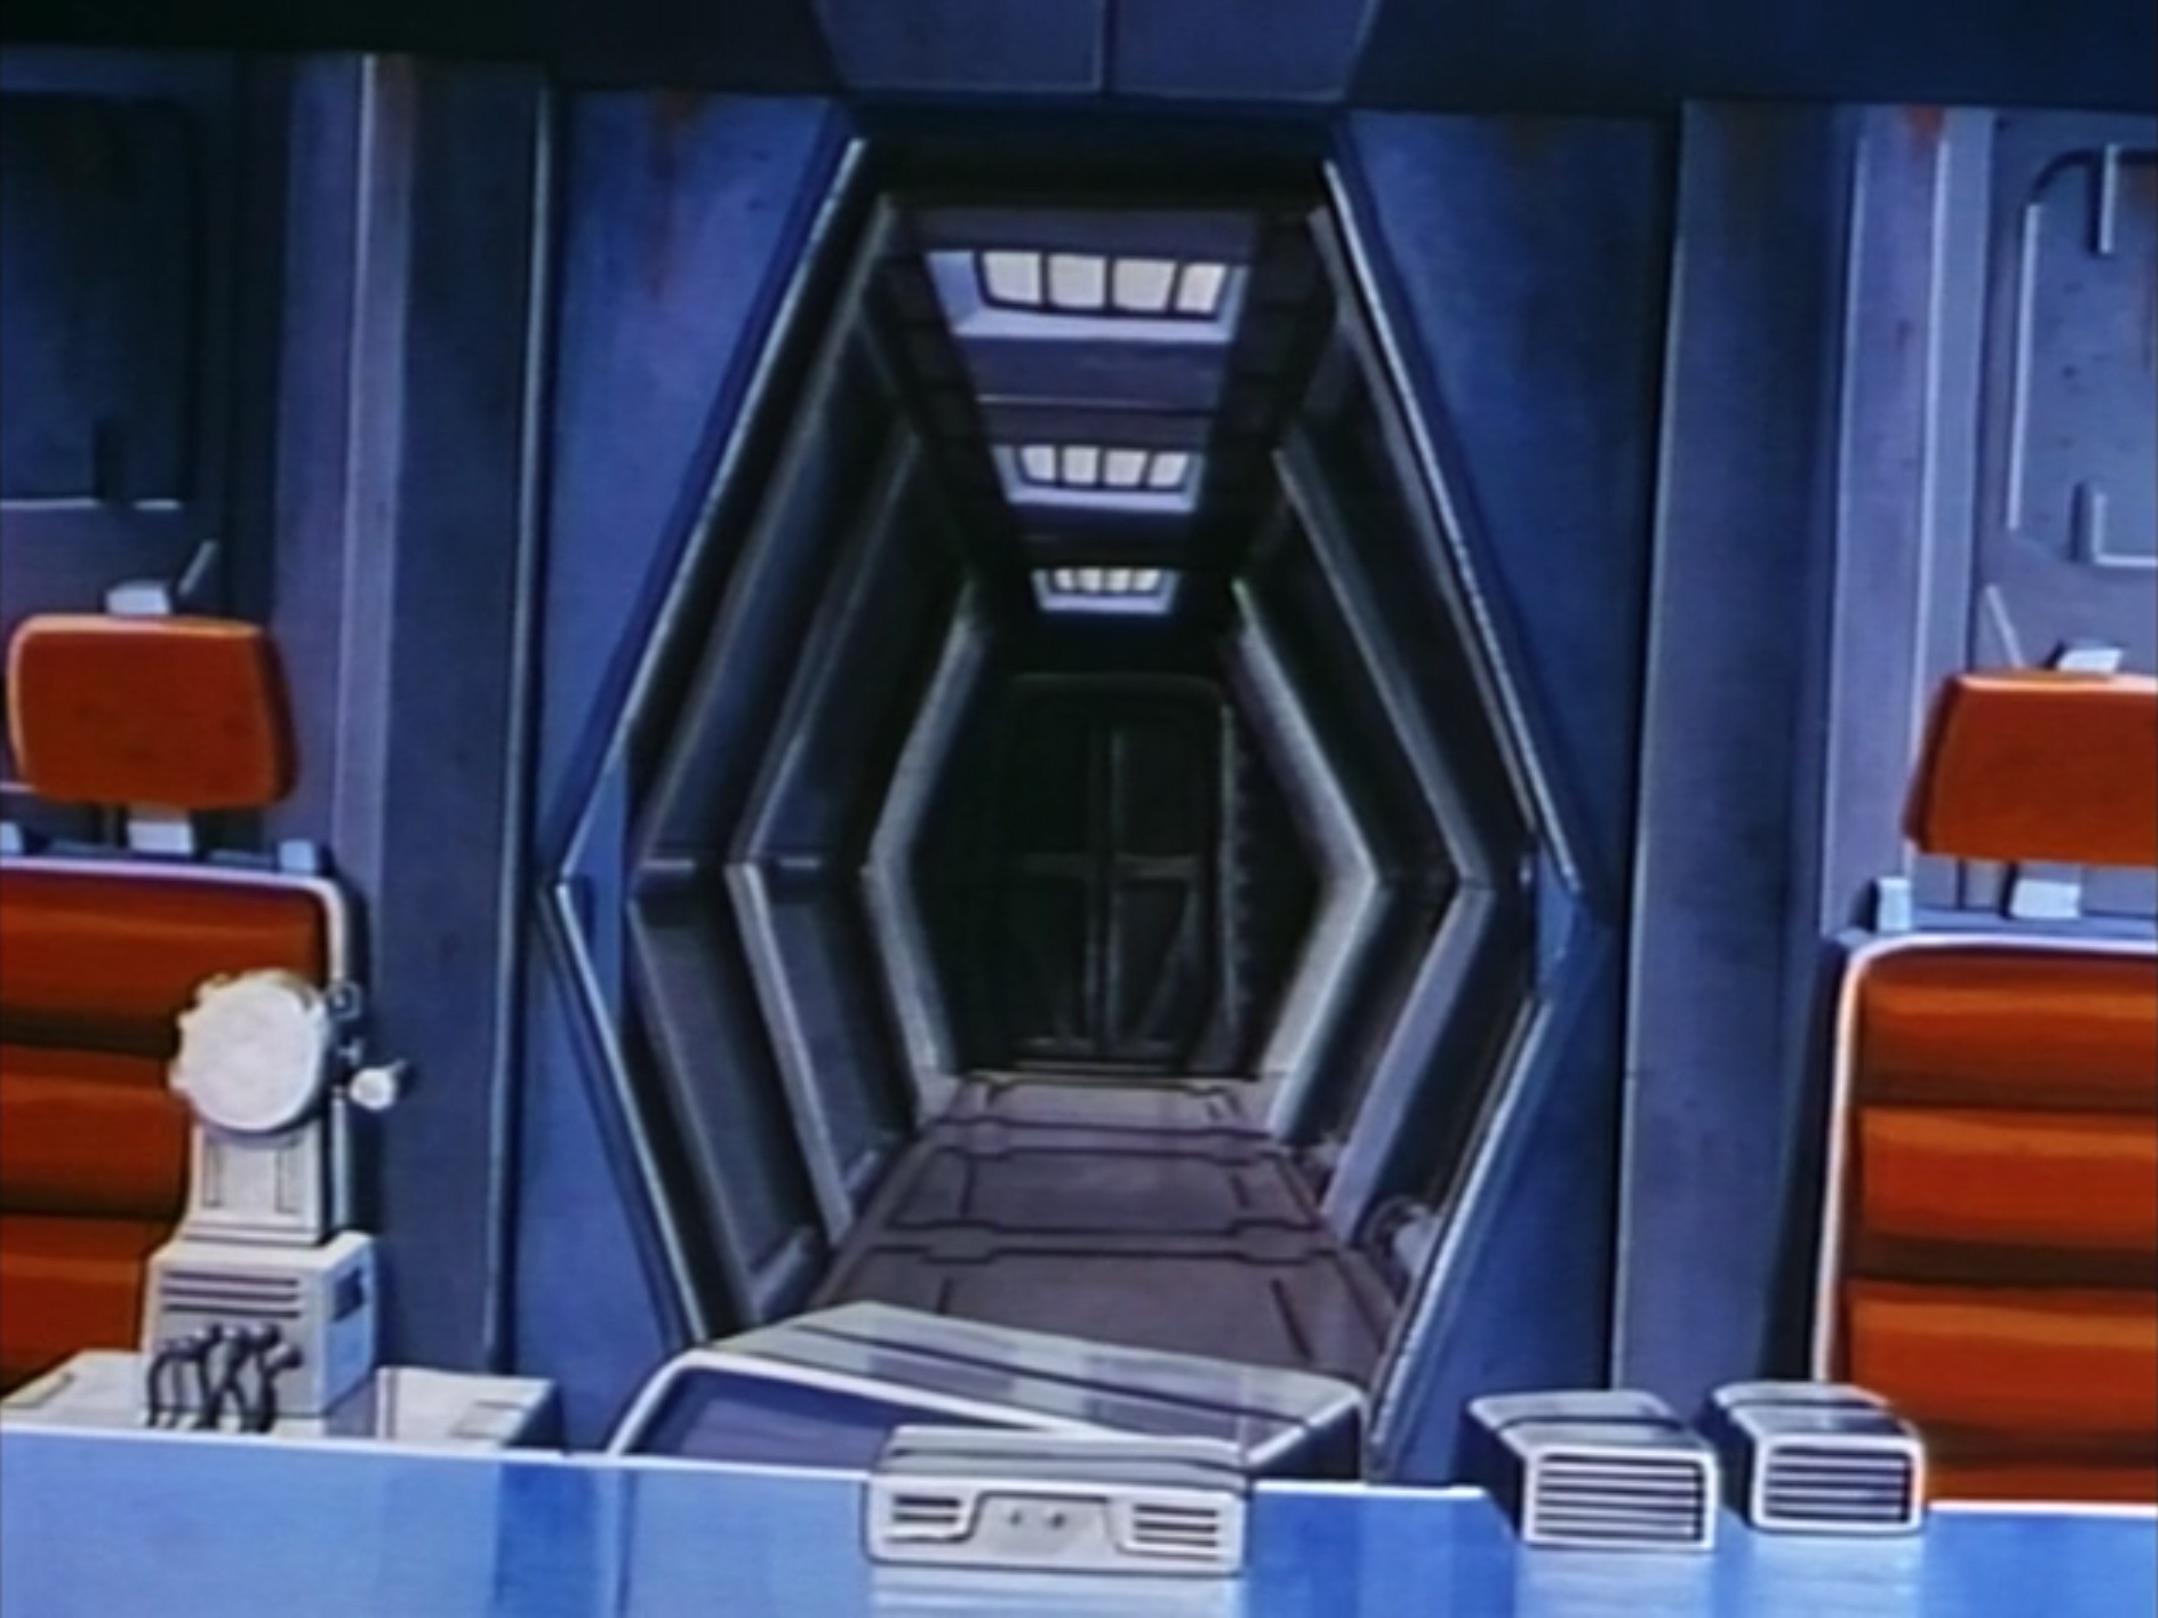 File:Cockpit1.jpg